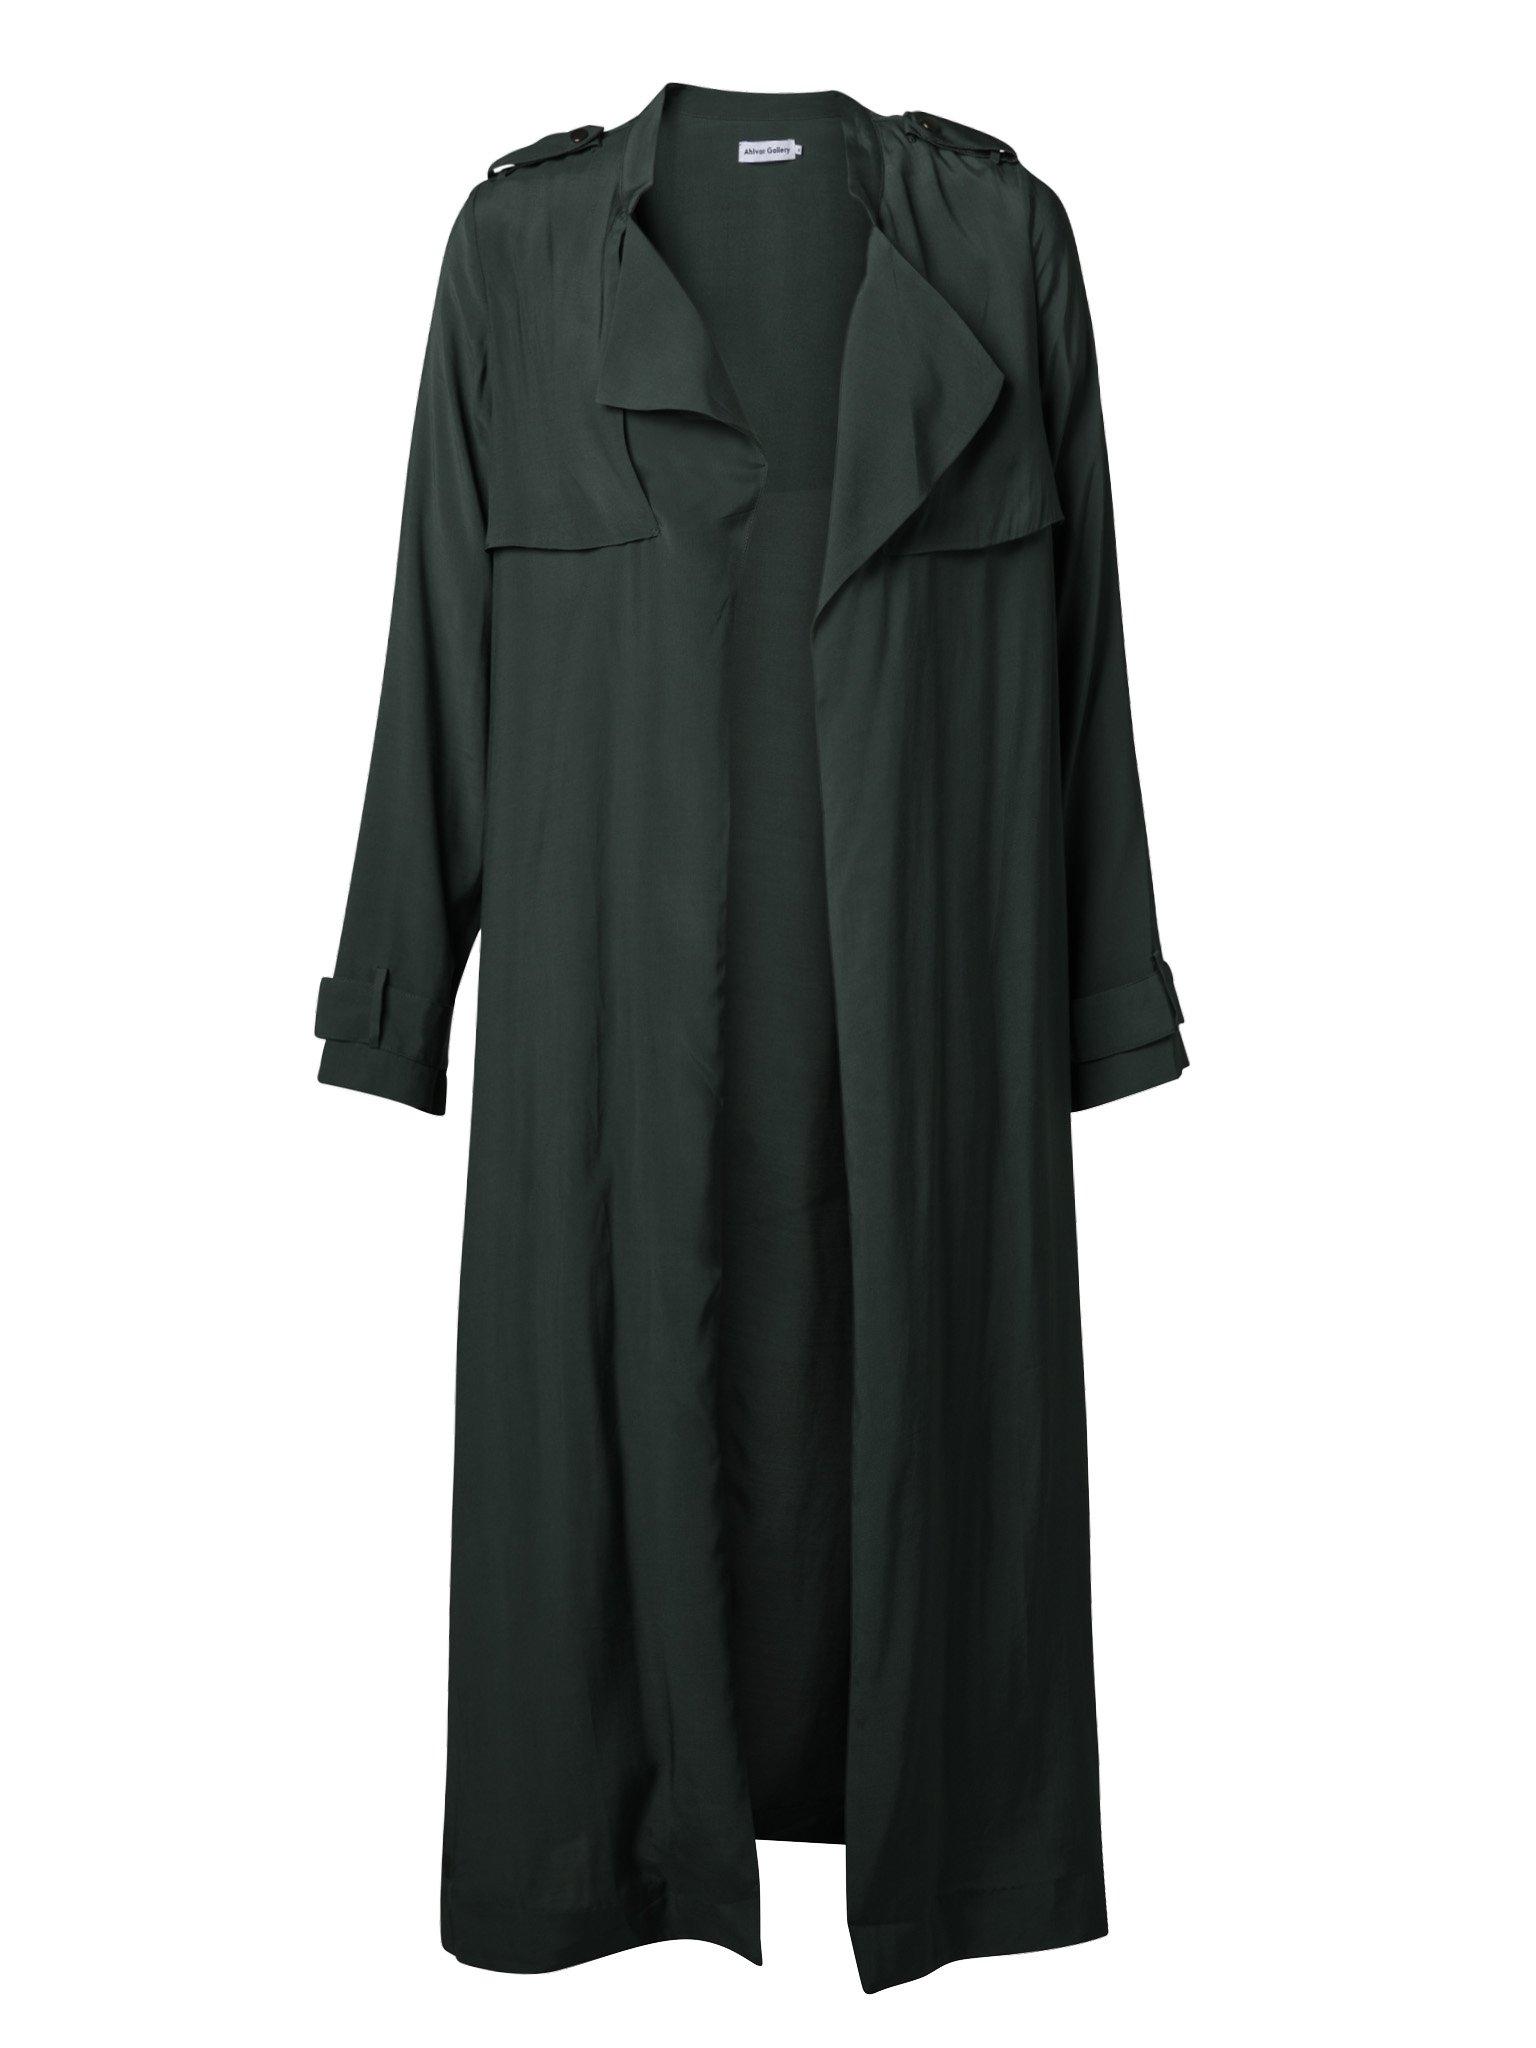 Kappa, Ahlvar, Takumi Coat